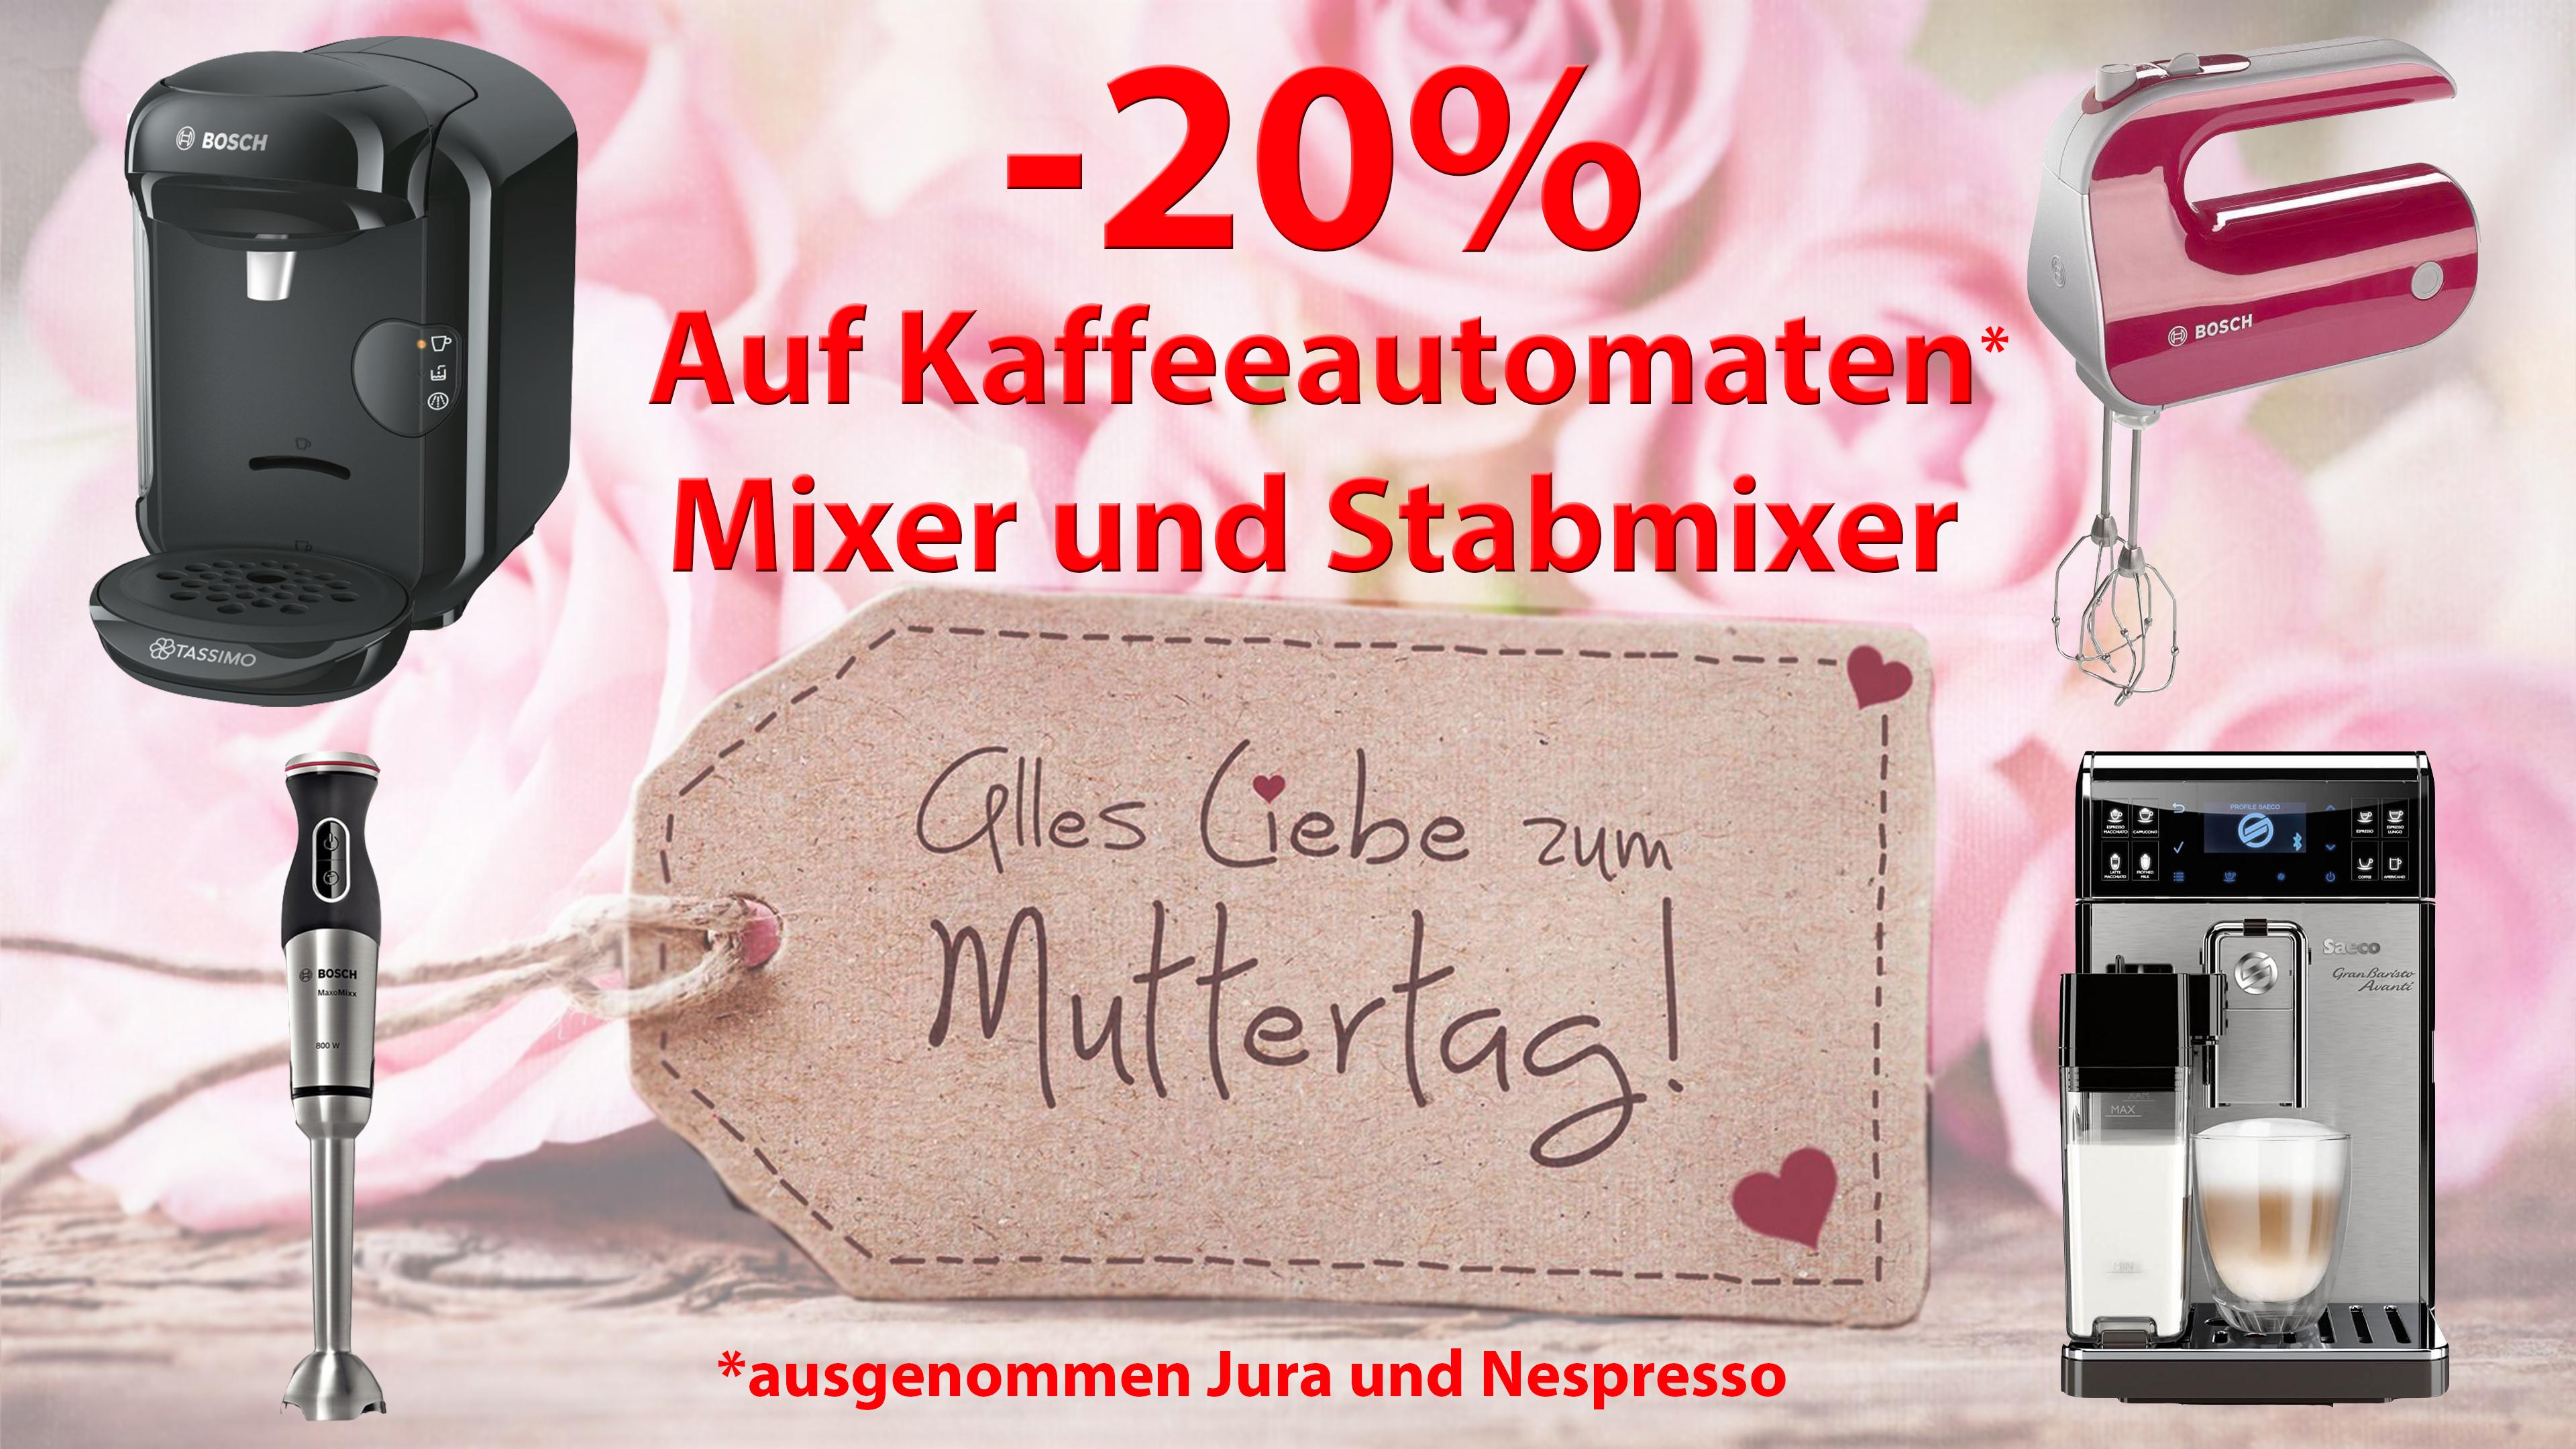 Werbung Muttertag Plakat